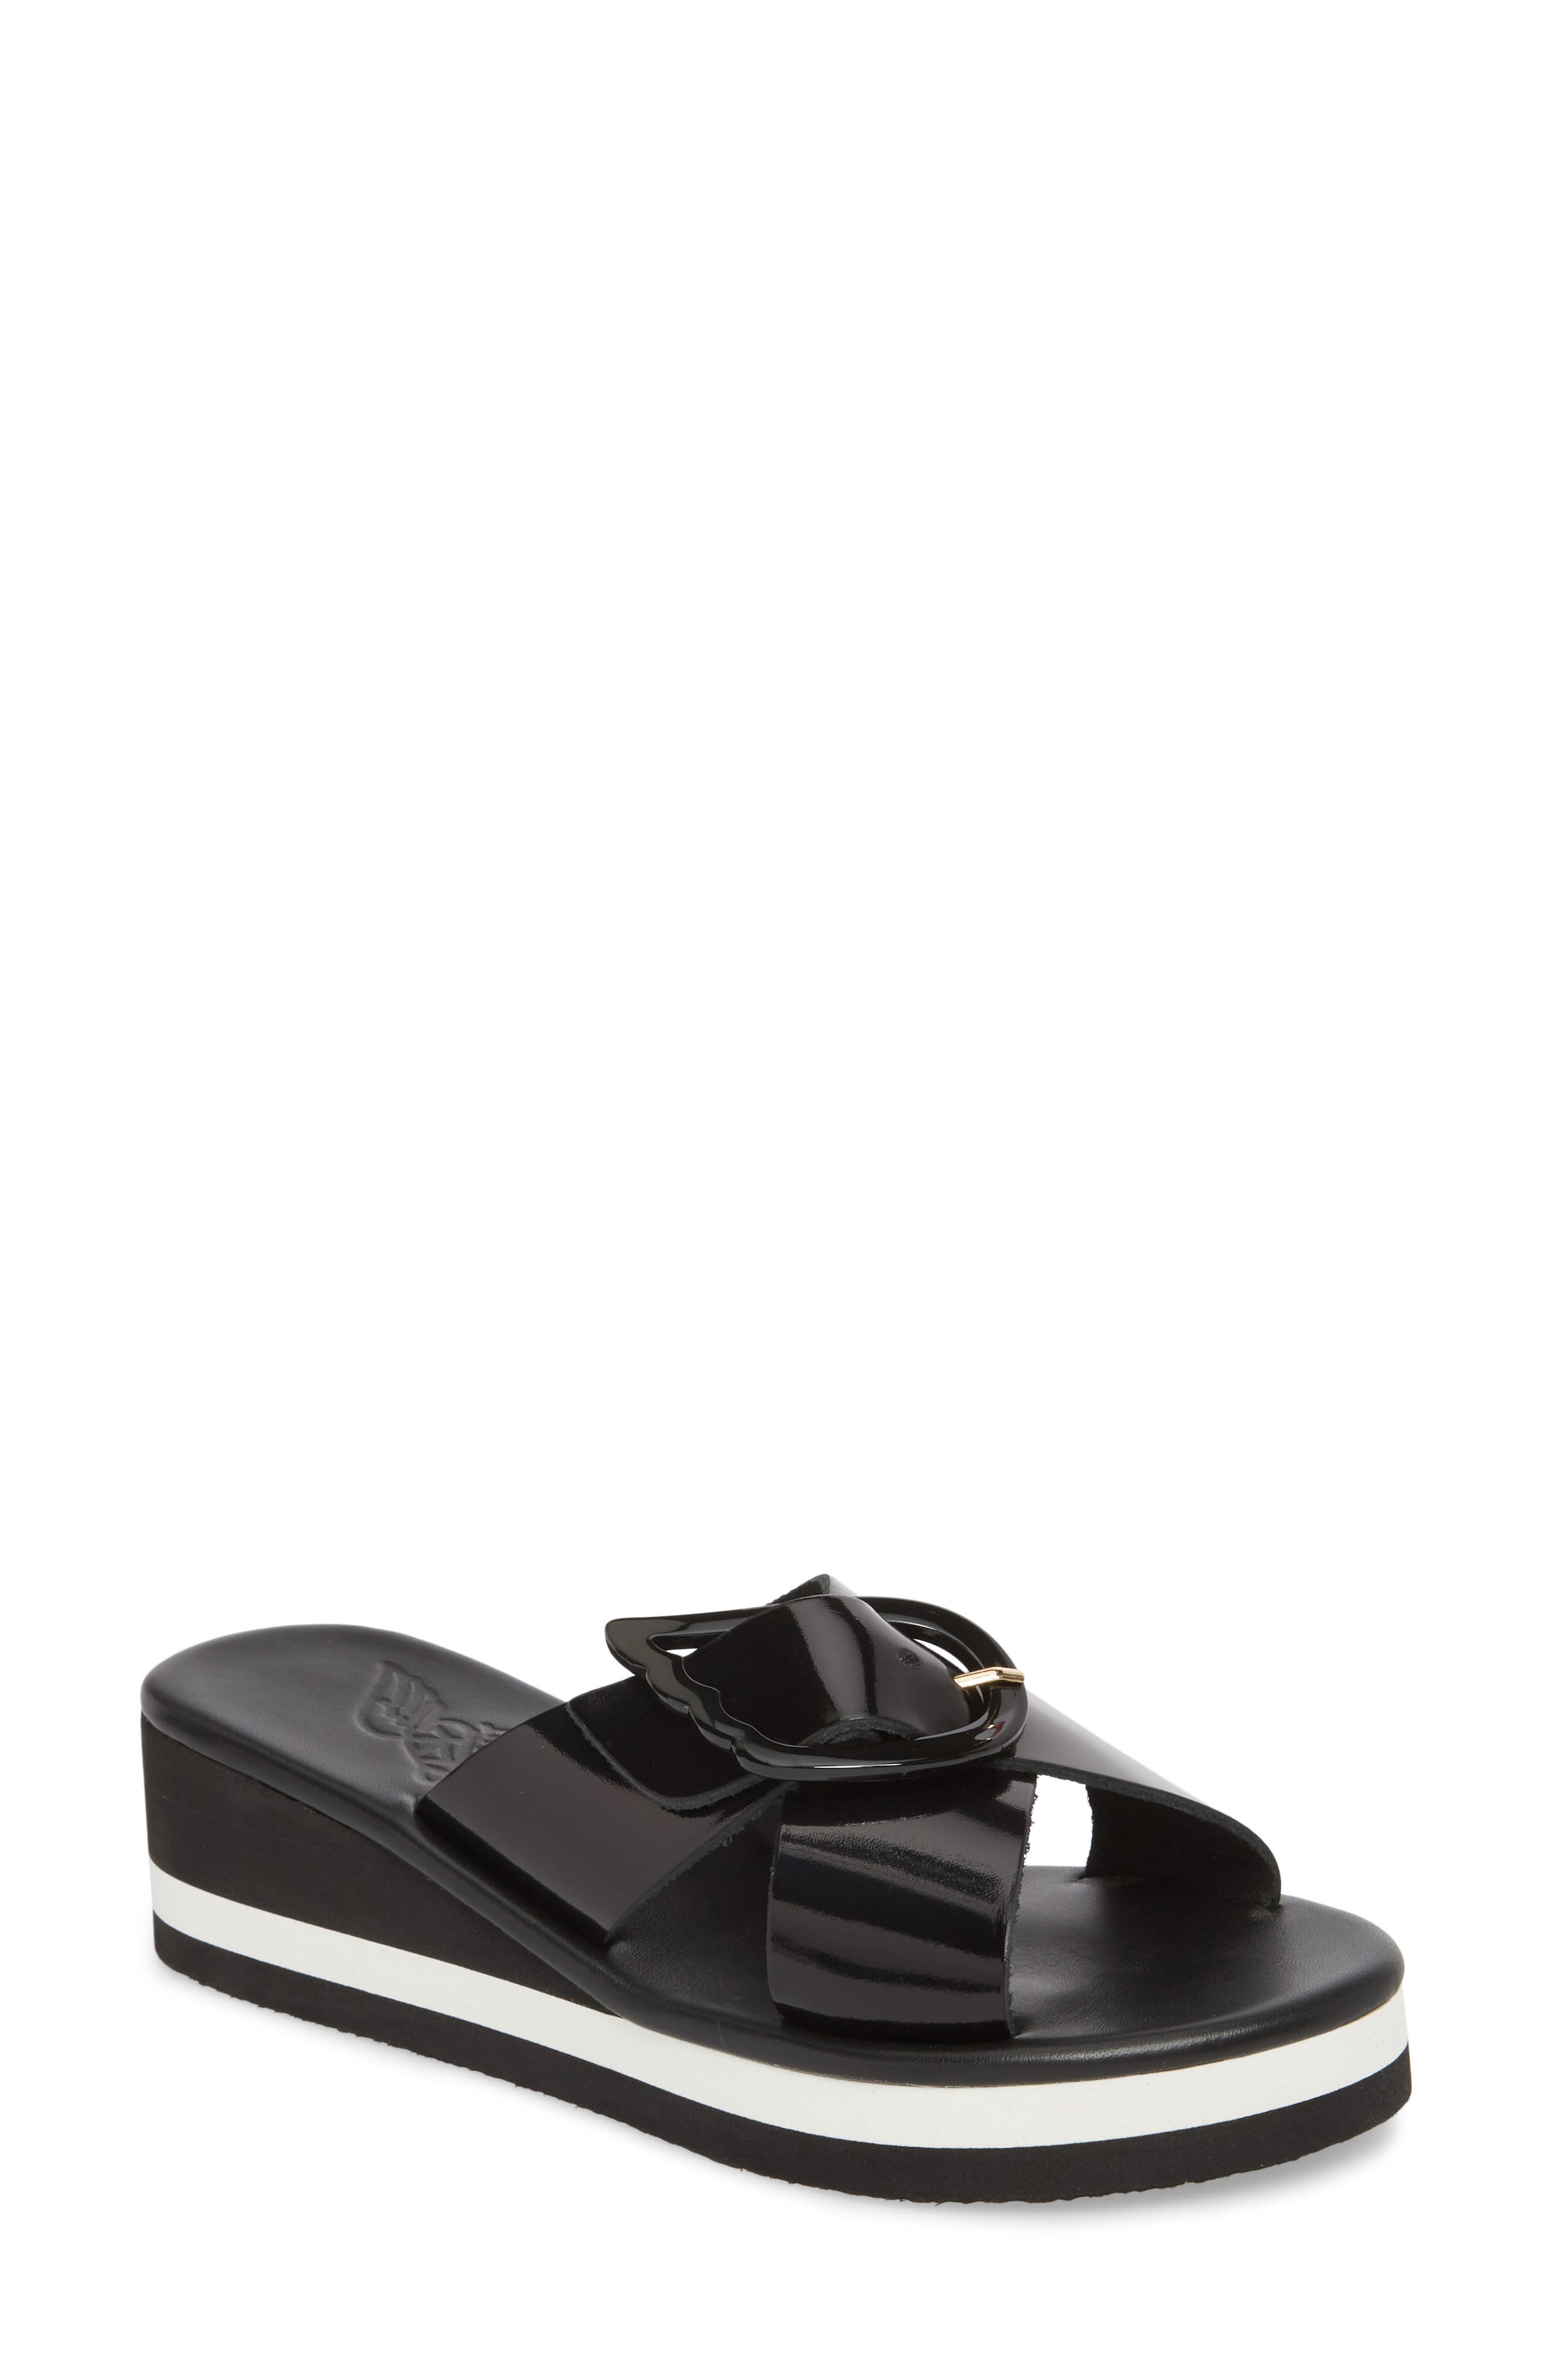 Thais Wedge Slide Sandal,                             Main thumbnail 1, color,                             Black